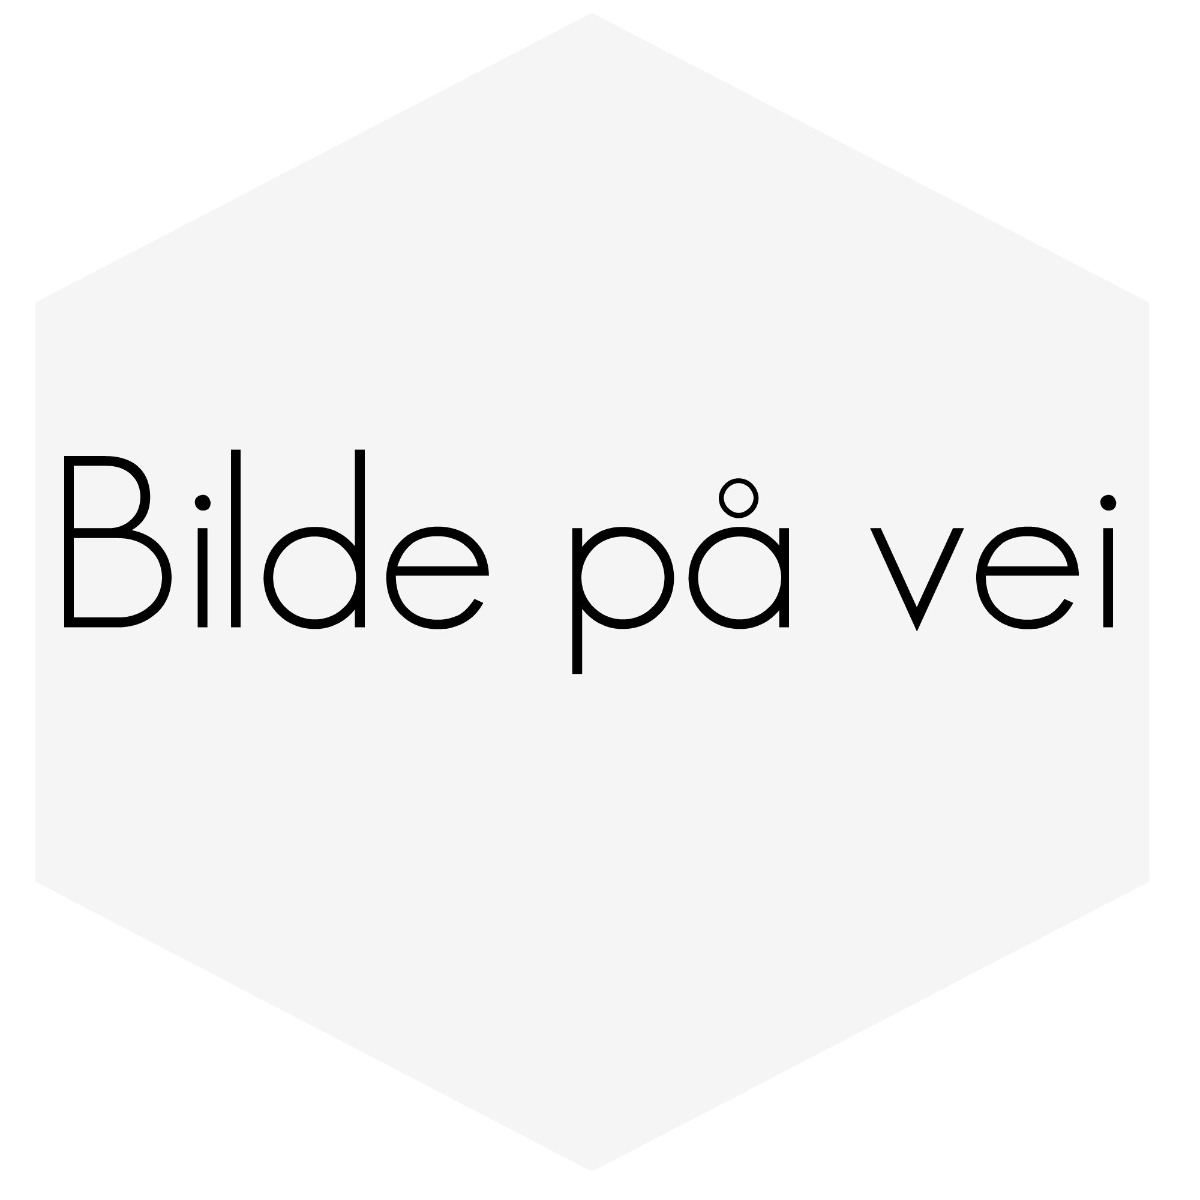 STYLING BAKFANGER KÅPE 940 STV (945) TYP 2 (KUN BAKDEL)